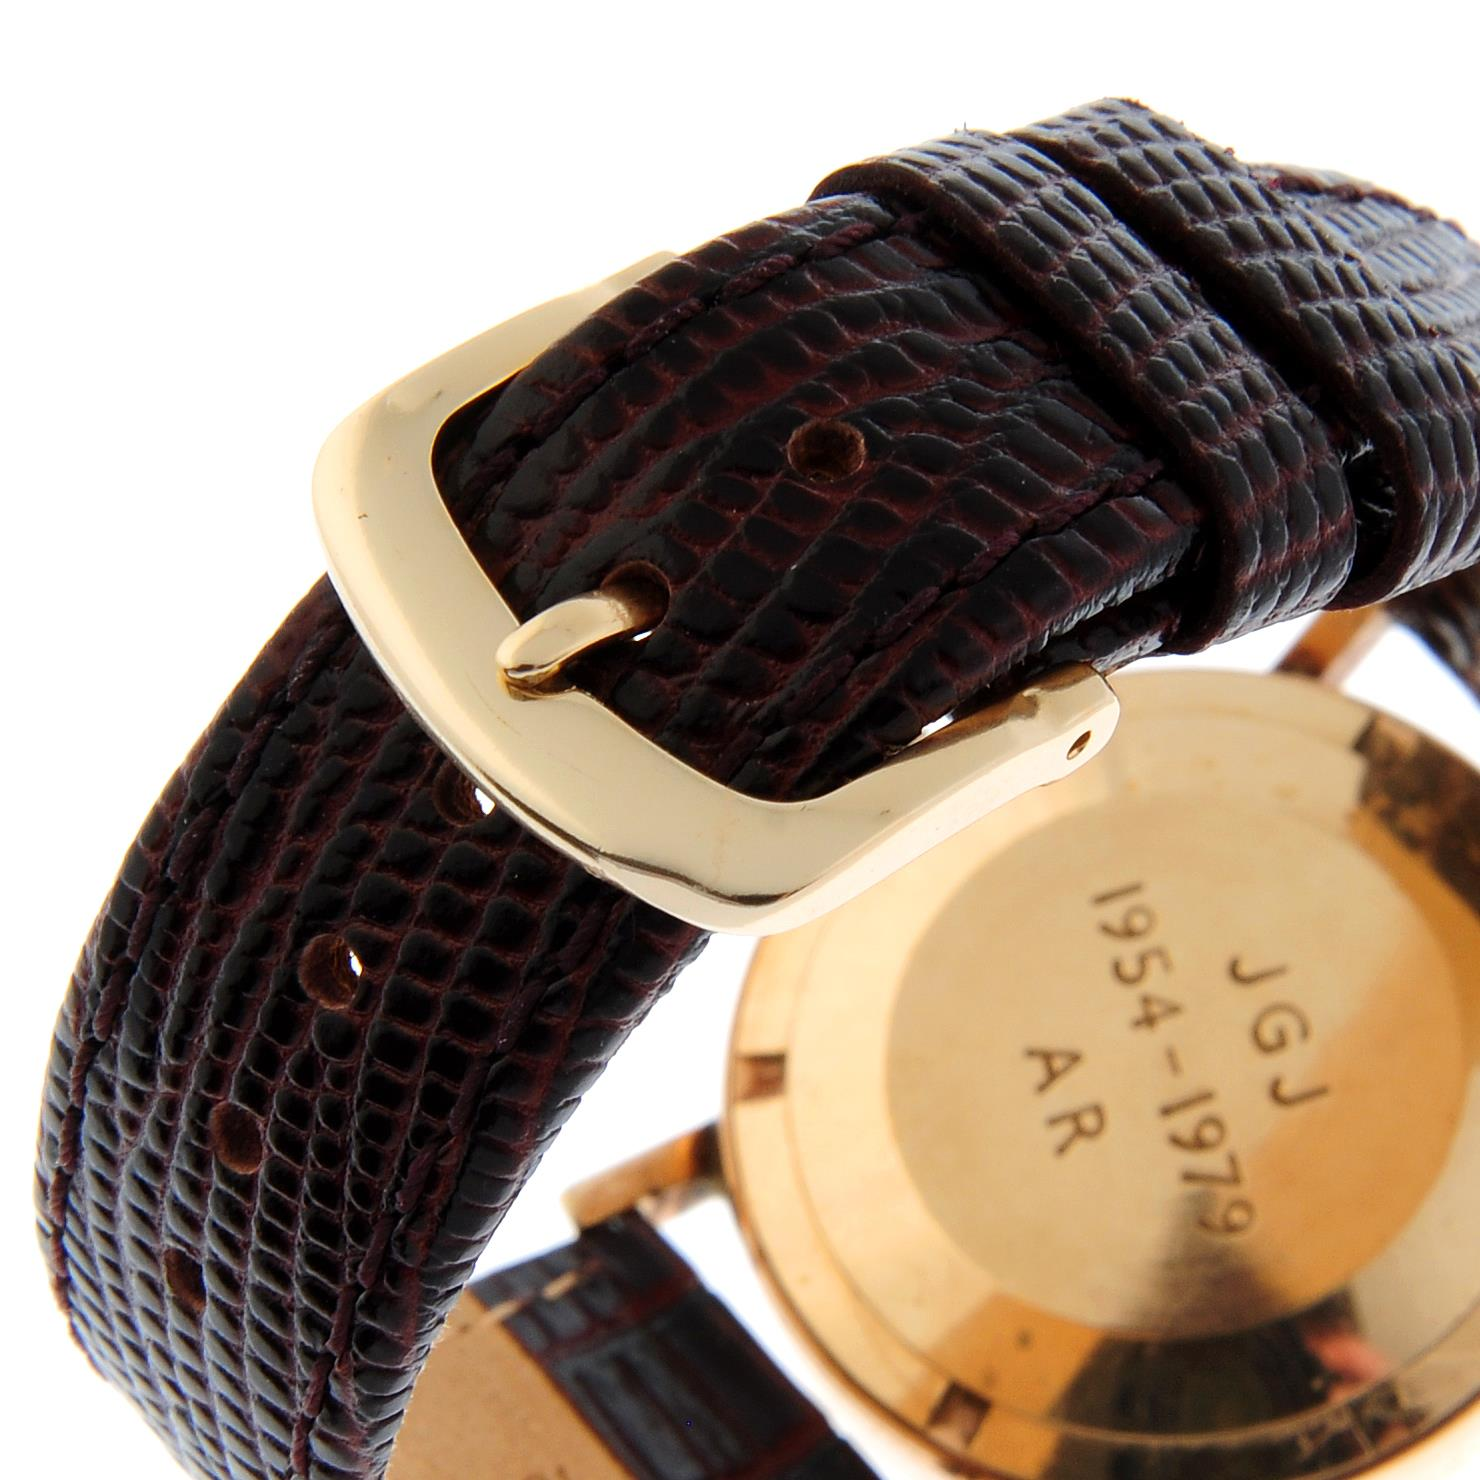 GARRARD - a wrist watch. - Image 2 of 4